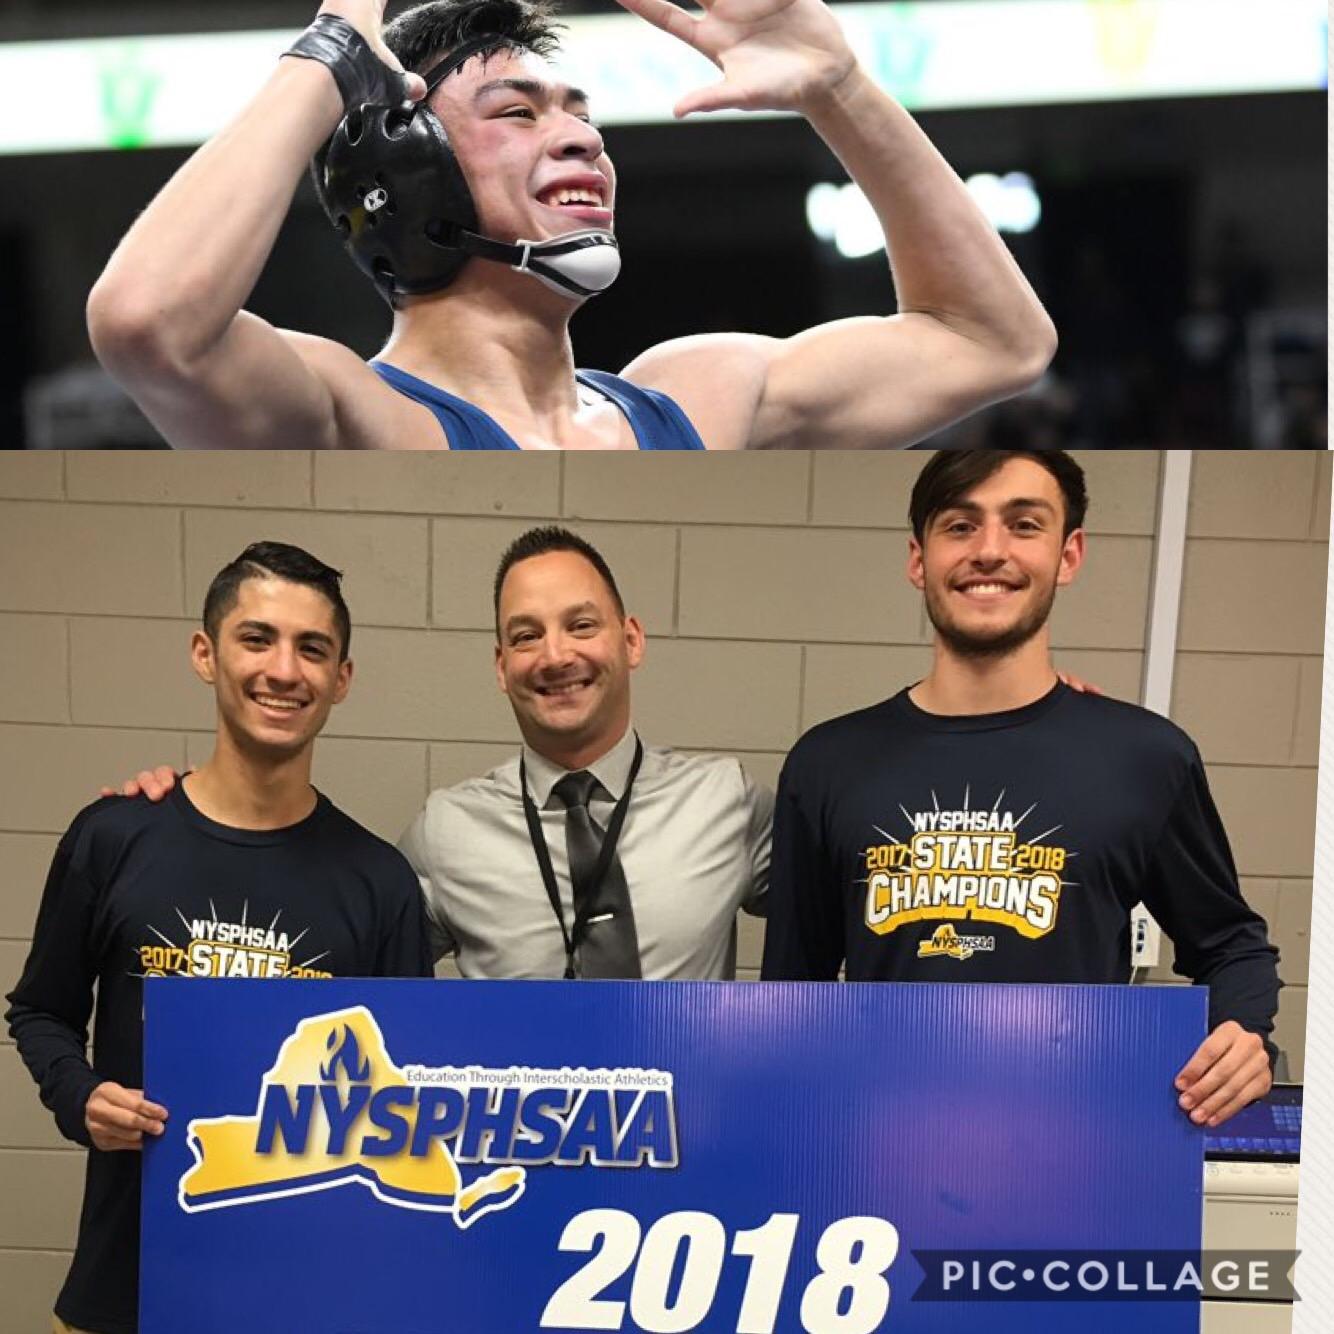 PMHS Champions 2018